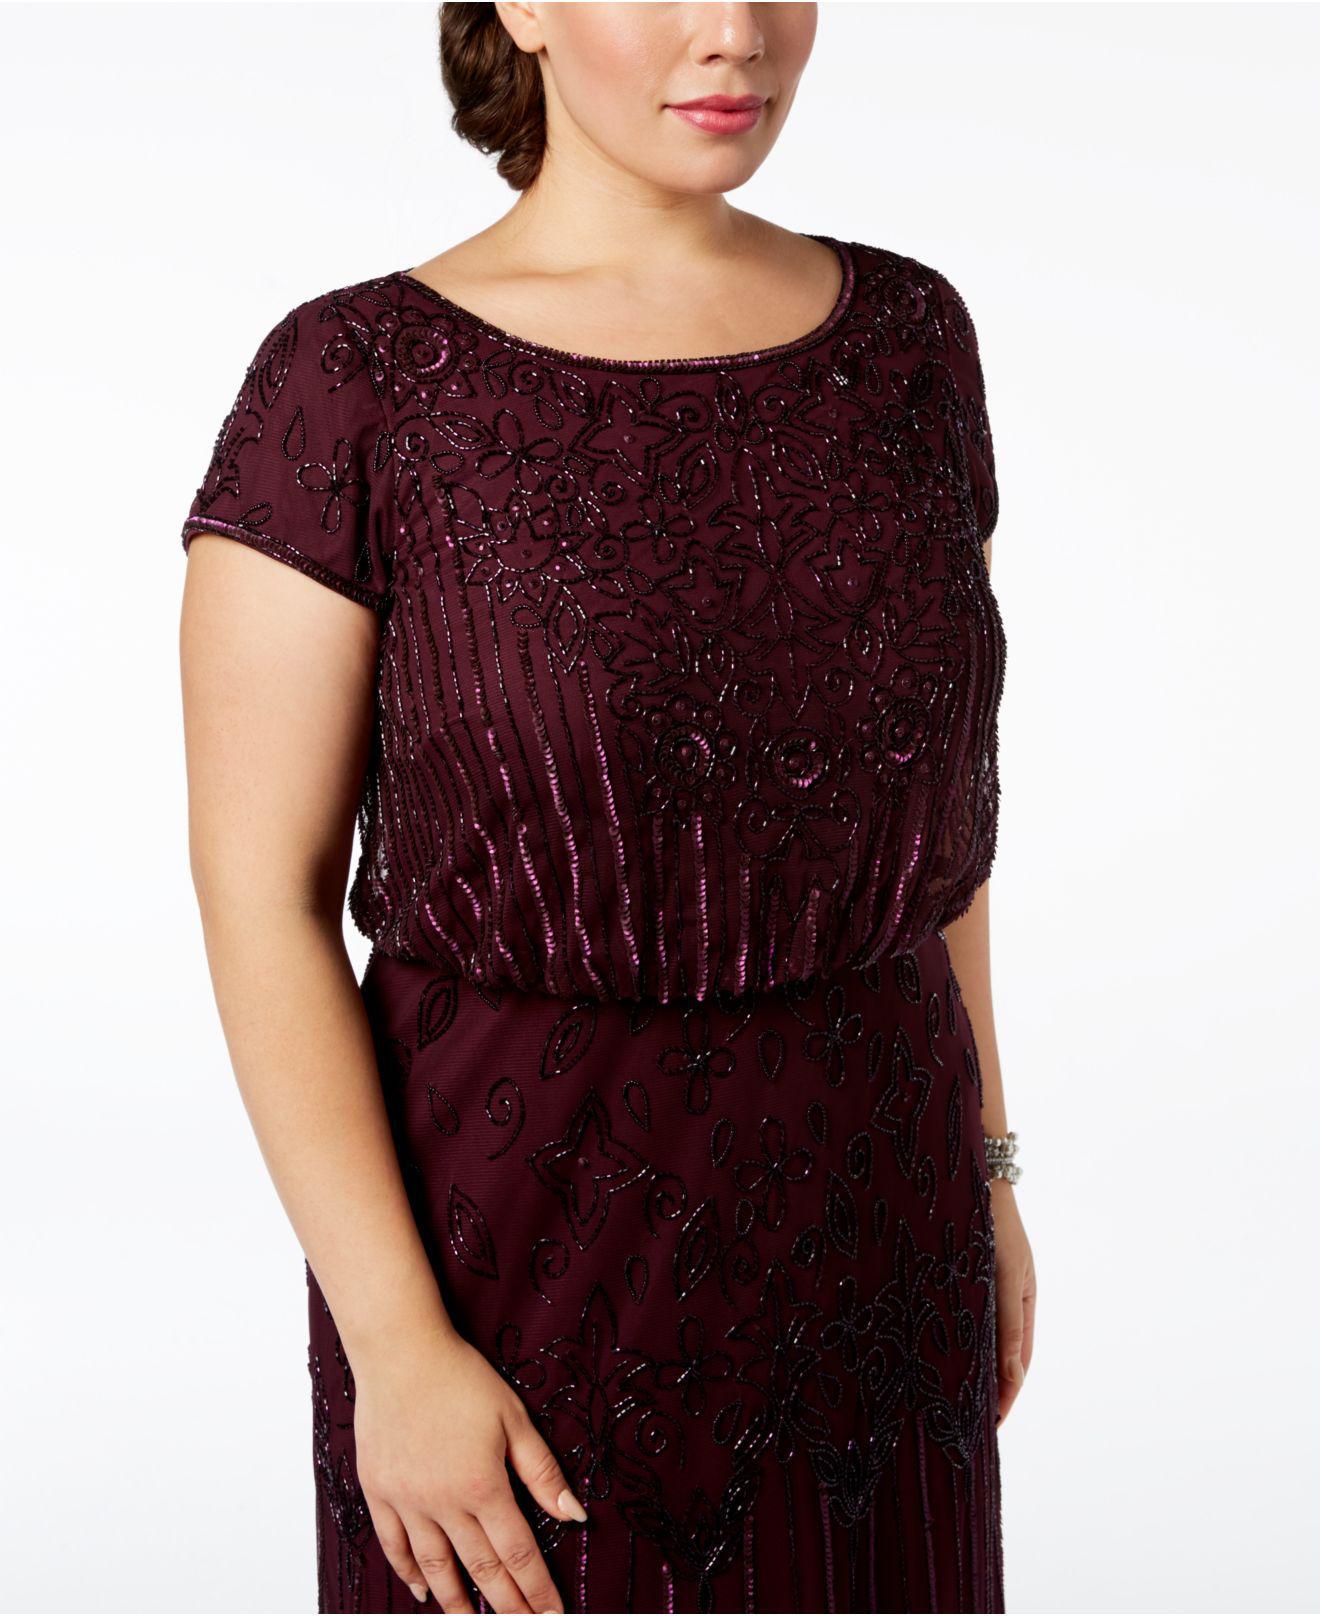 448da53f670bd Lyst - Adrianna Papell Plus Size Bead-illusion Blouson Dress